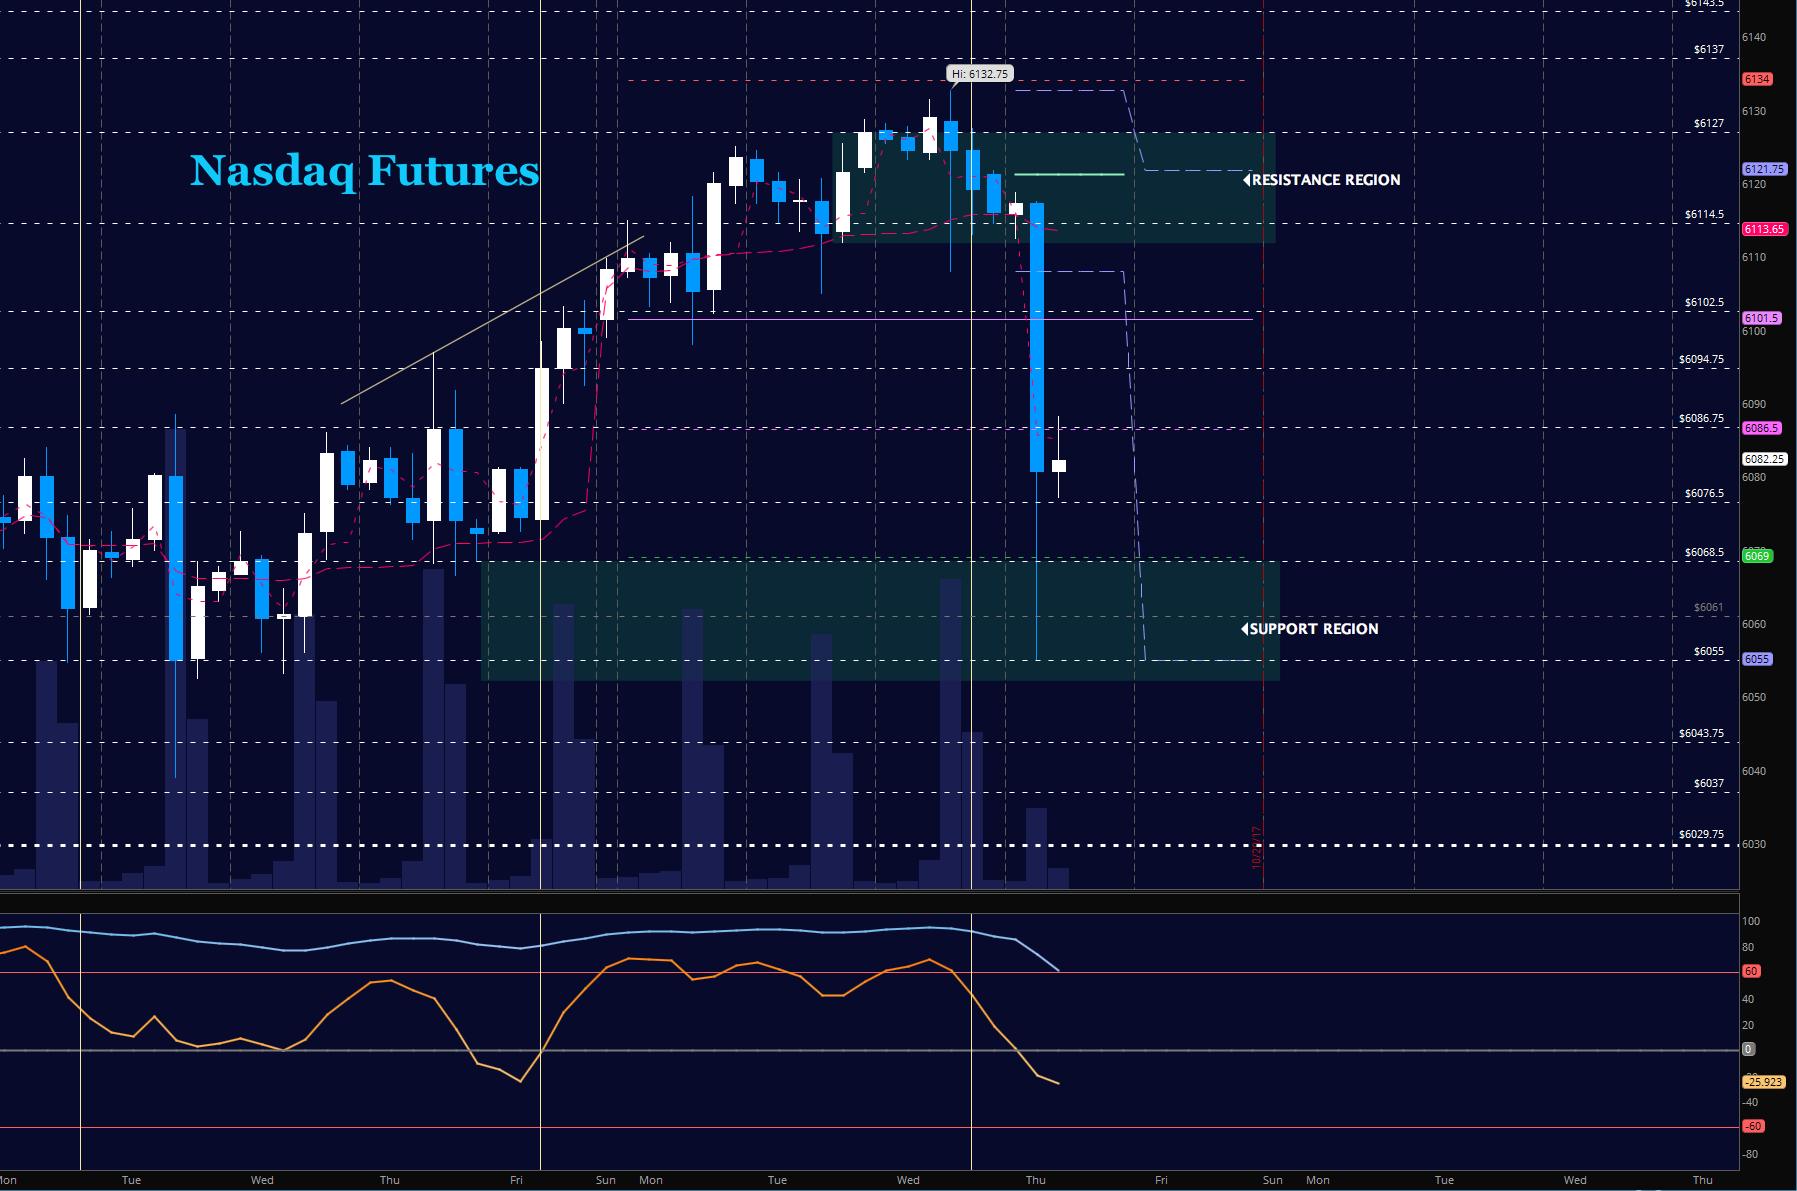 nasdaq futures october 19 stock market trading update chart analysis news